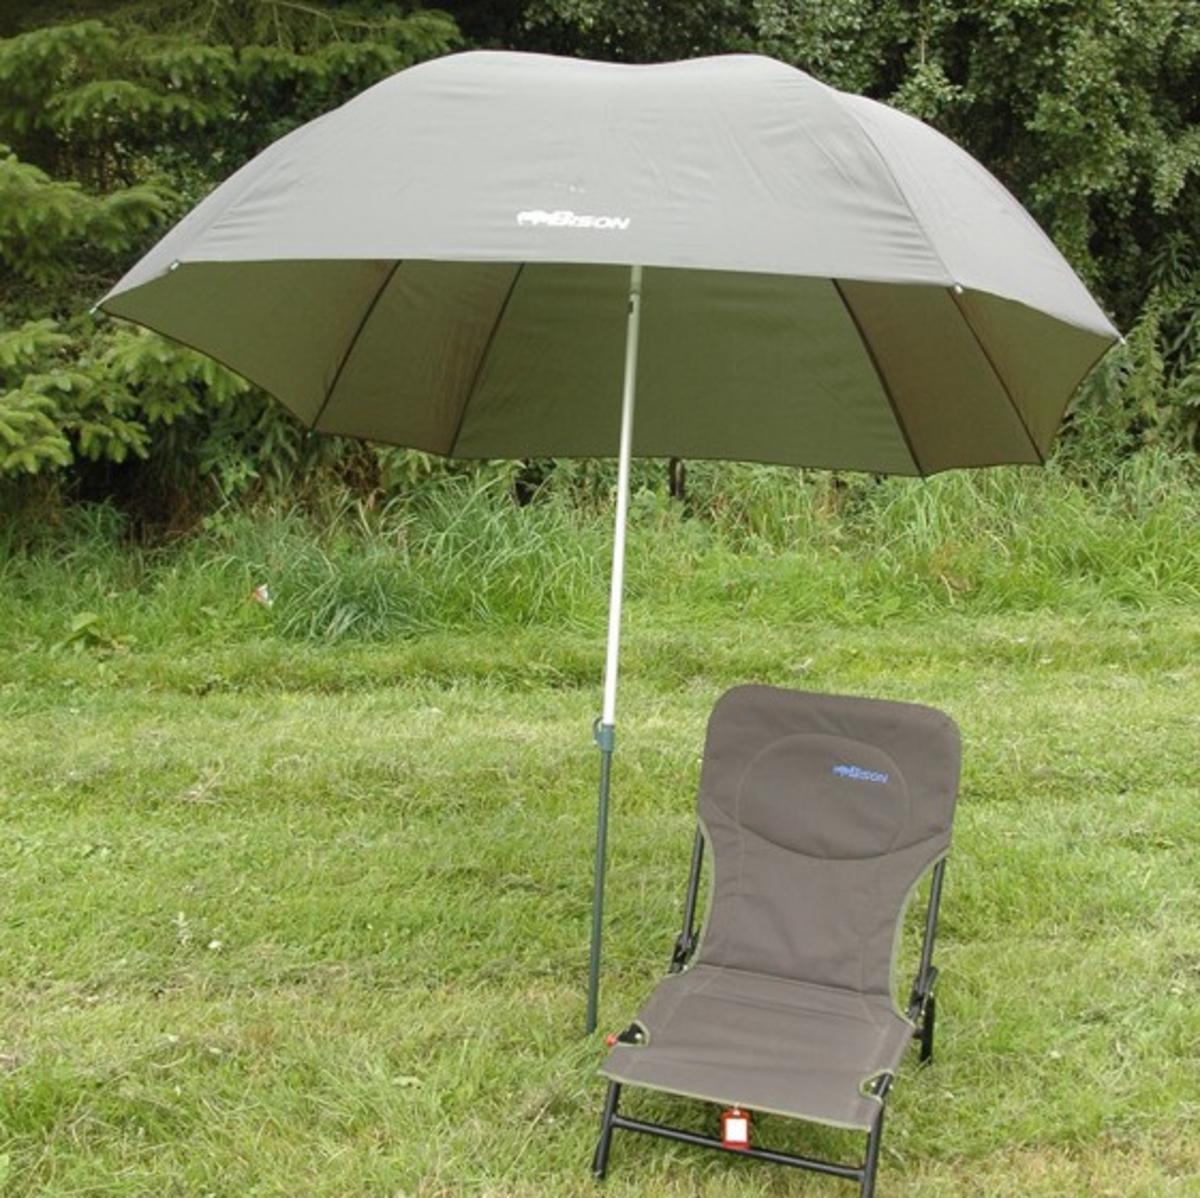 98 bison top tilt fishing umbrella brolly shelter for Boat umbrellas fishing